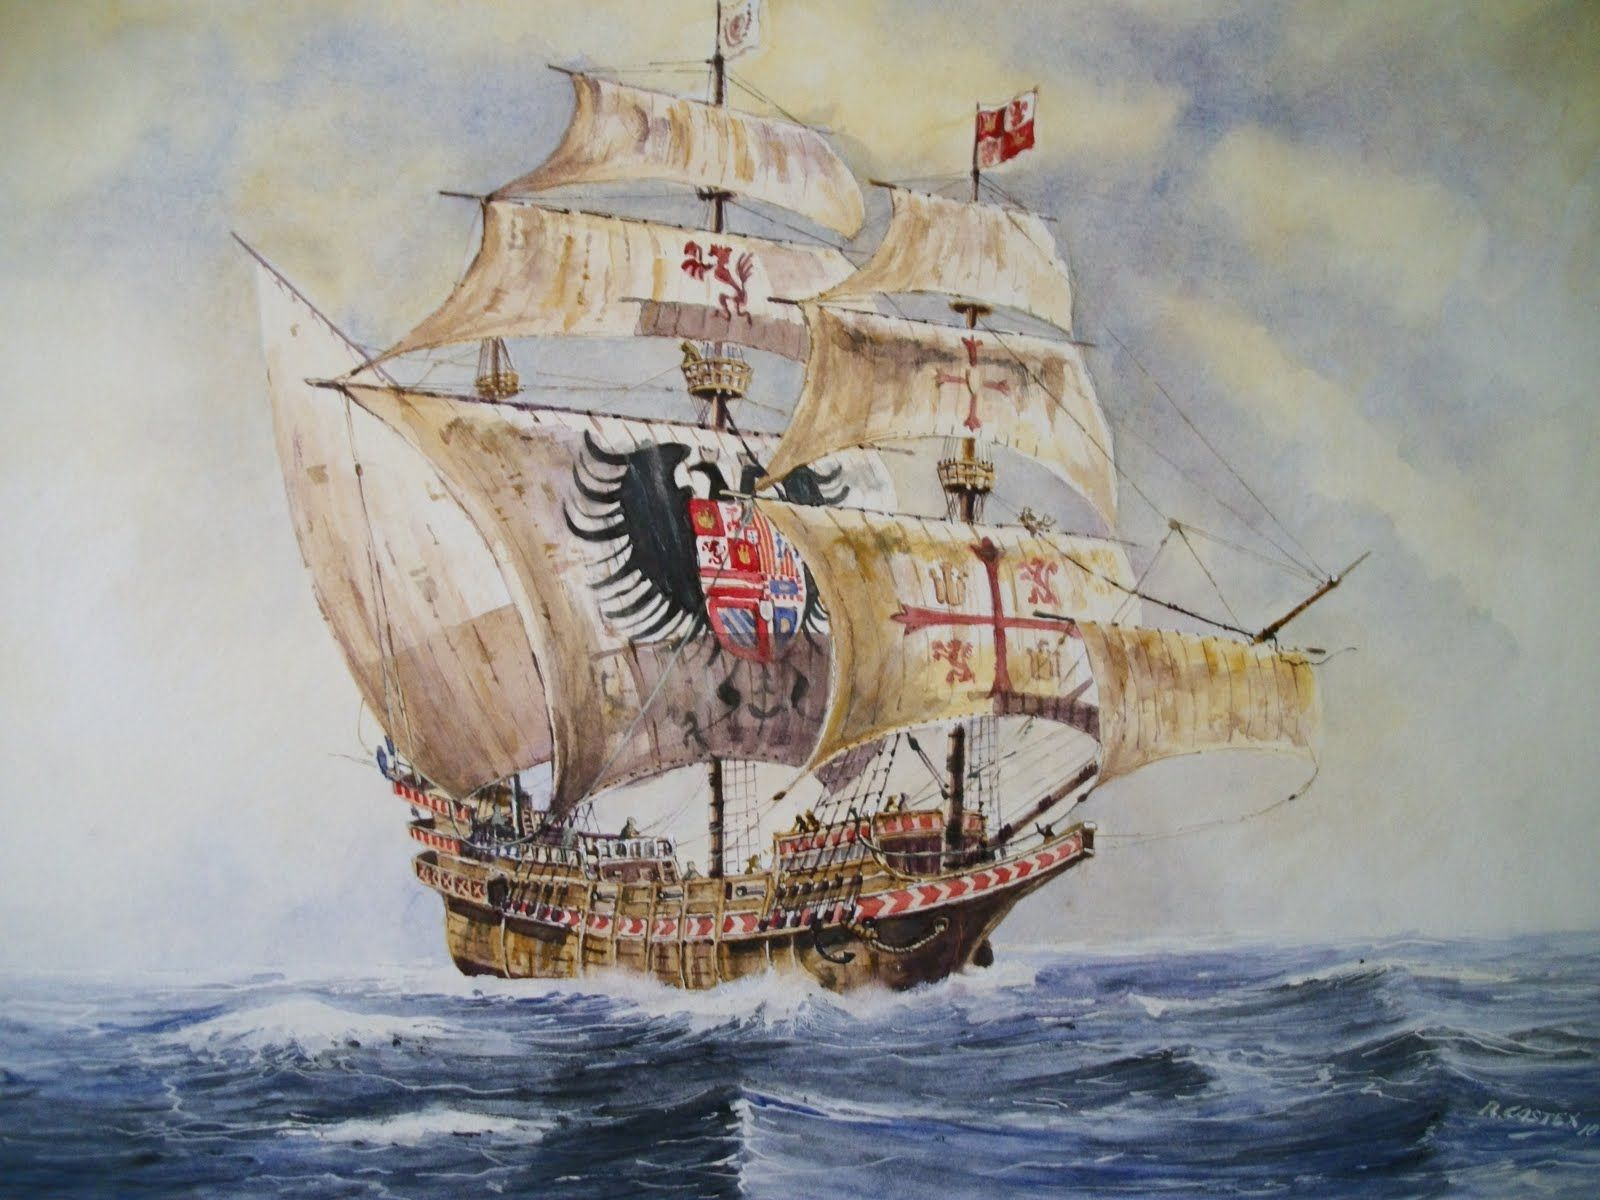 http://www.abc.es/historia/abci-san-mateo-roca-flotante-imperio-espanol-combatio-ocho-galeones-franceses-solitario-201801080404_noticia.html